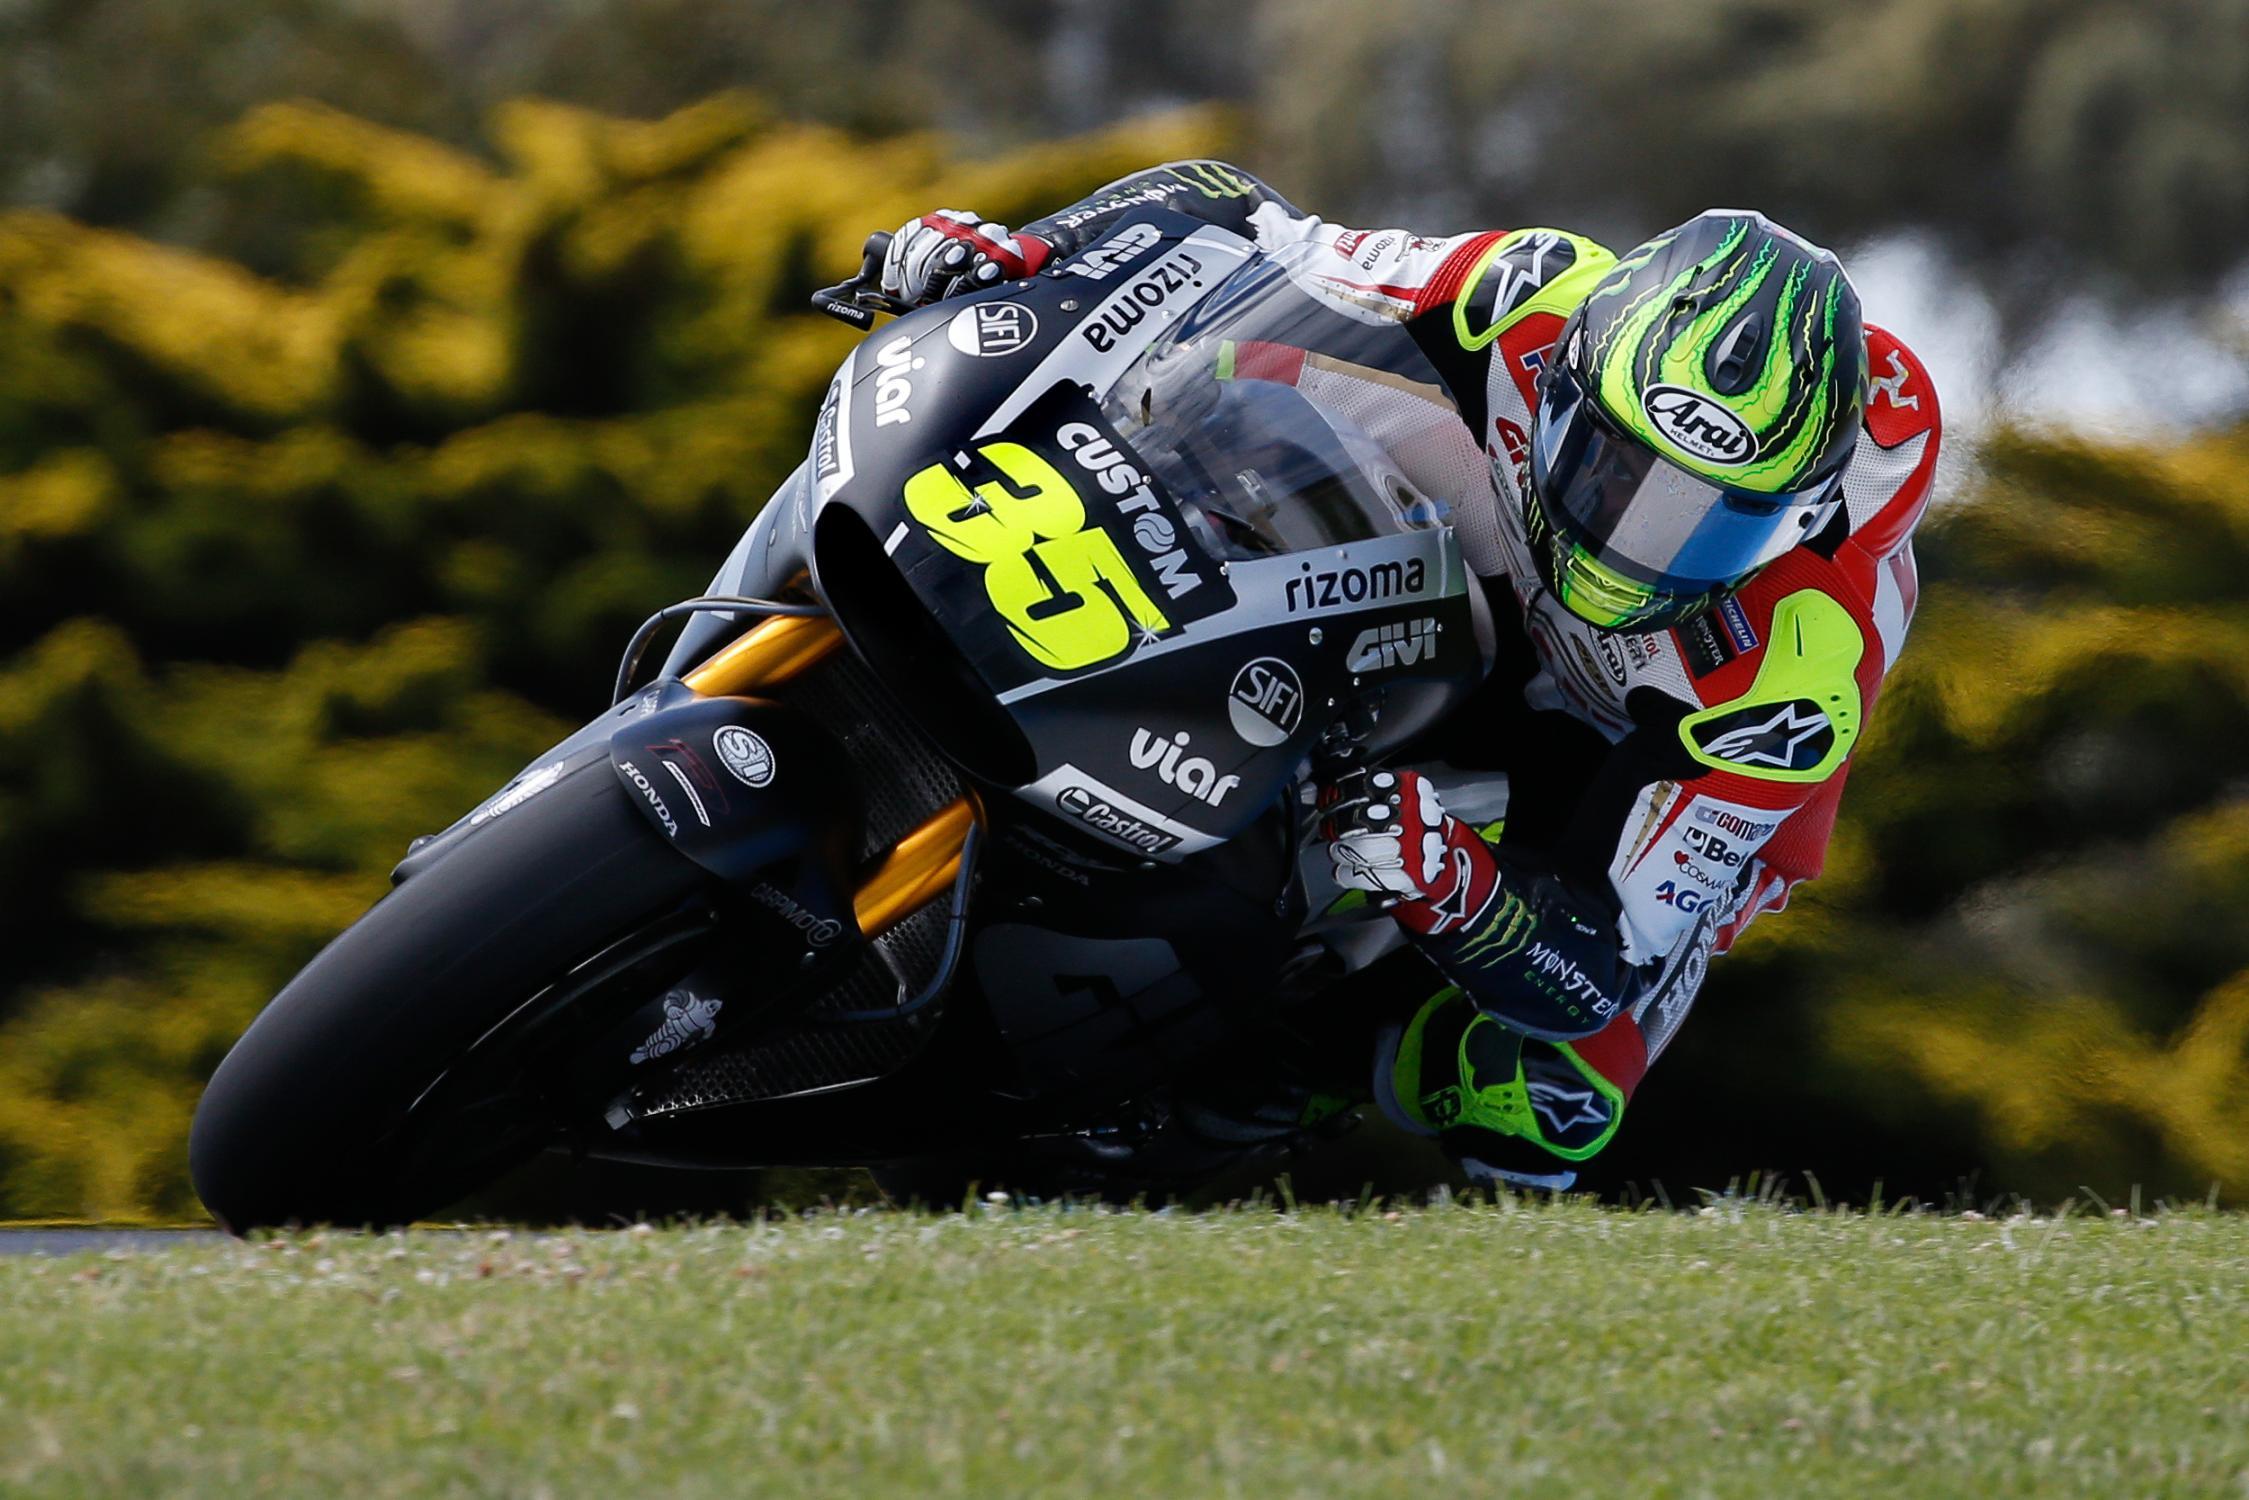 [MotoGP] Test Phillip Island 35-cal-crutchlow-eng_tp23593.gallery_full_top_fullscreen